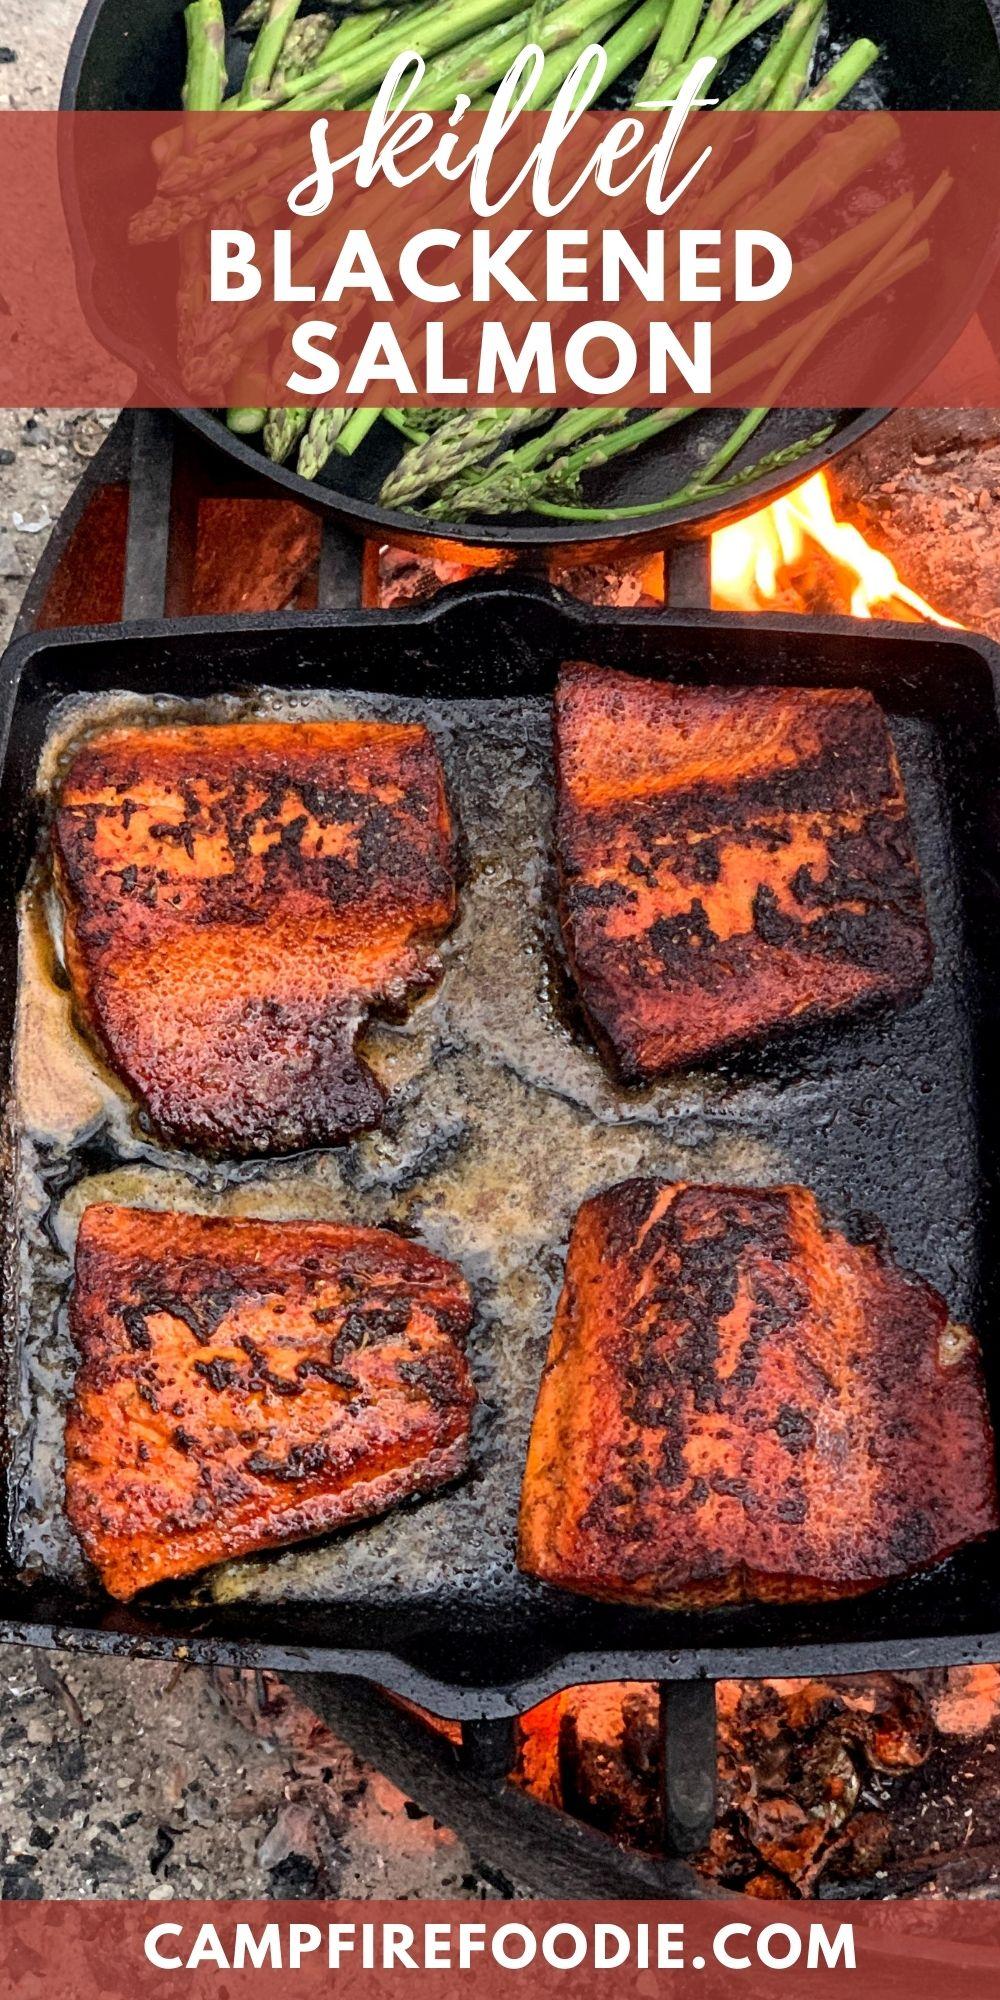 Skillet Blackened Salmon Recipe